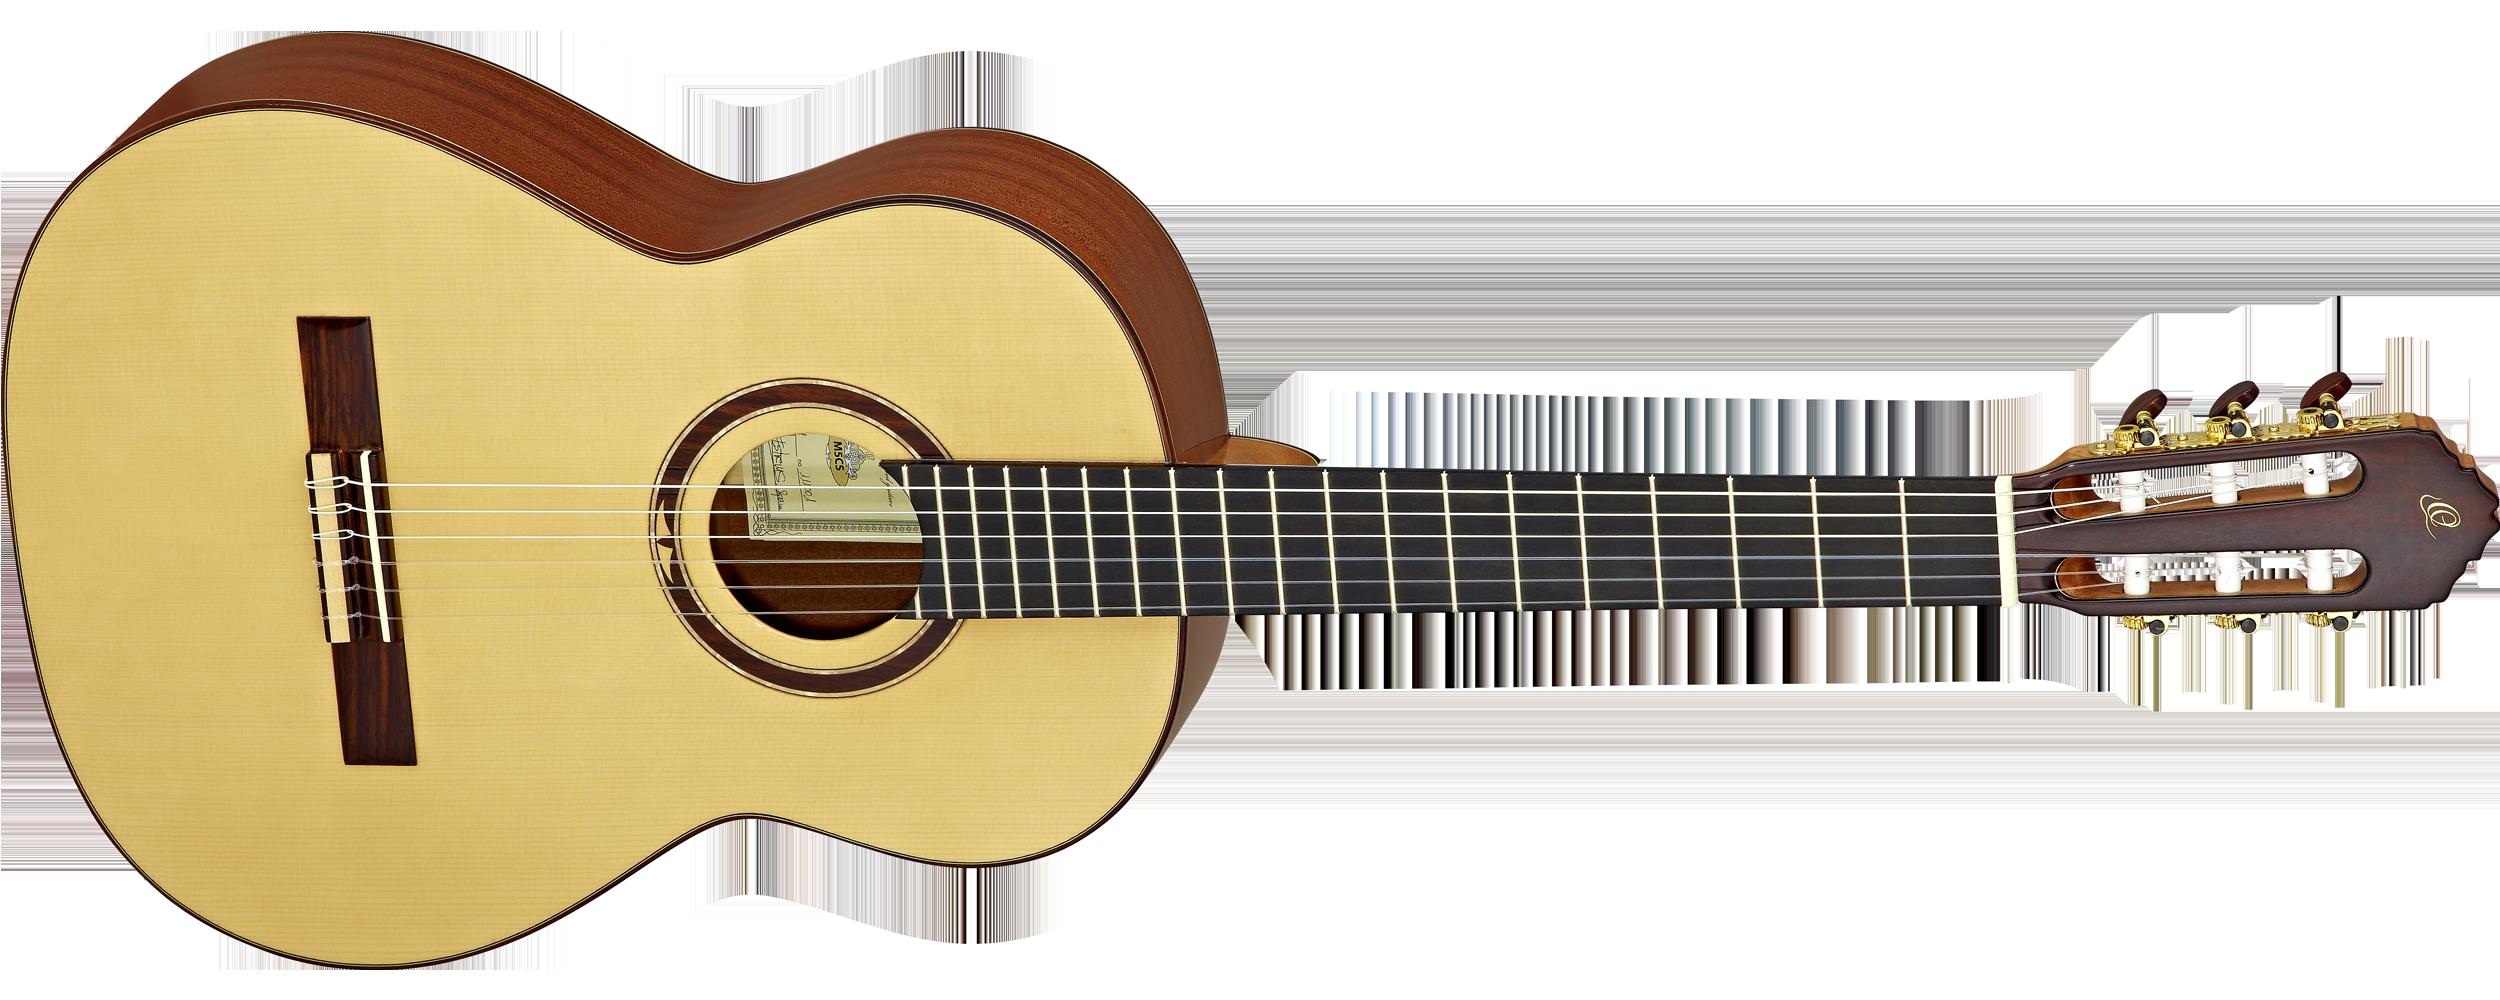 Ortega your m cs. Clipart guitar guitar spain